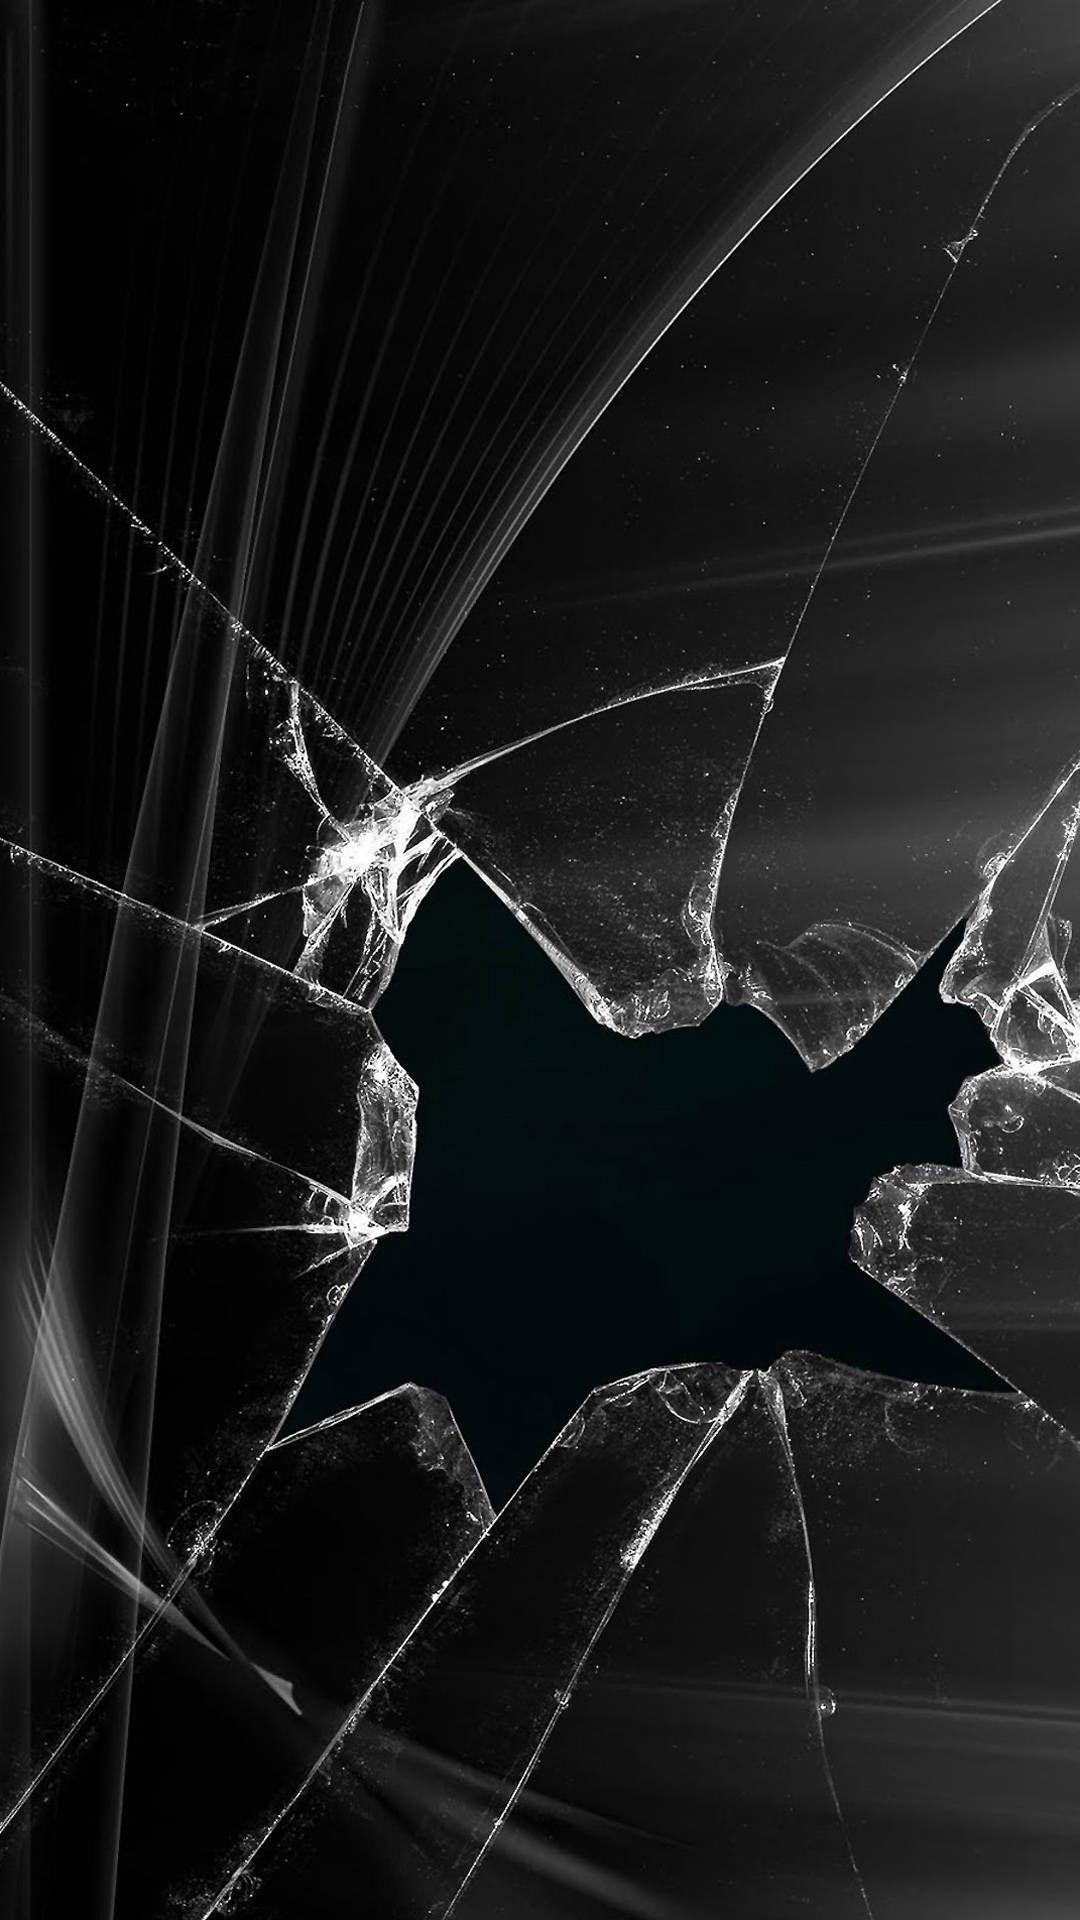 broken screen hd samsung galaxy s4 wallpaper | love wallpaper